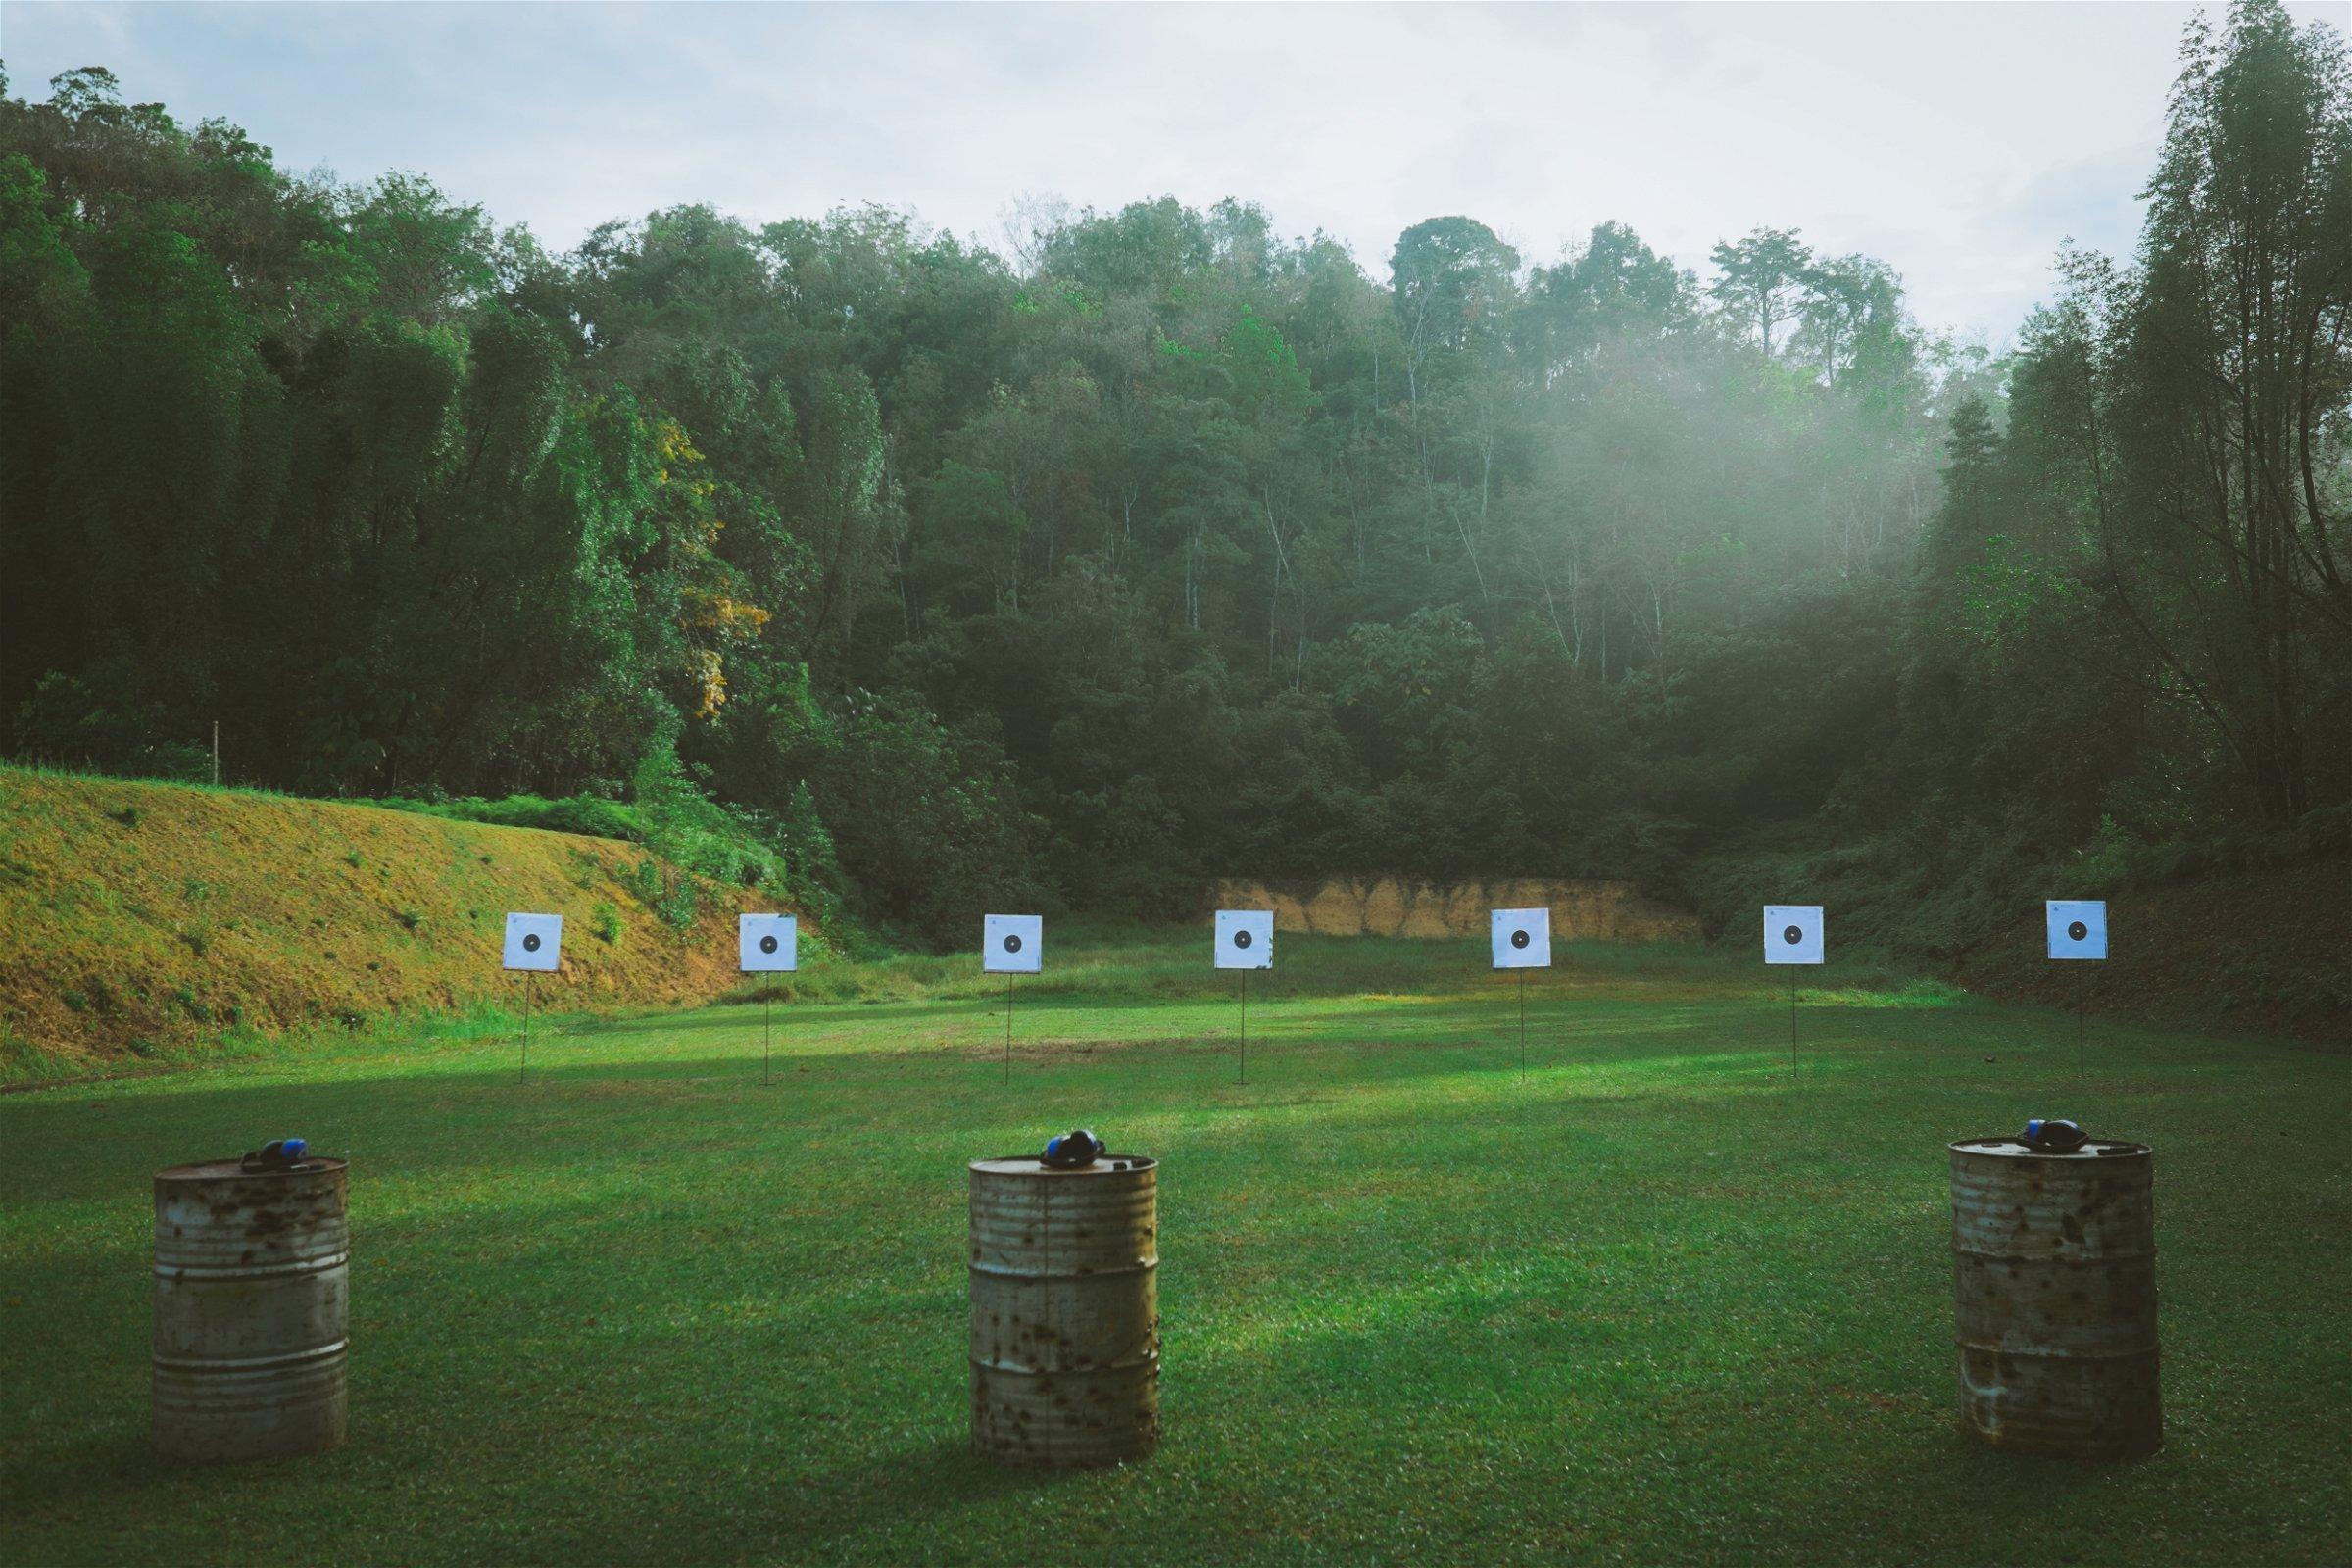 Outdoor Gun Range. Photo by Shutterstock.